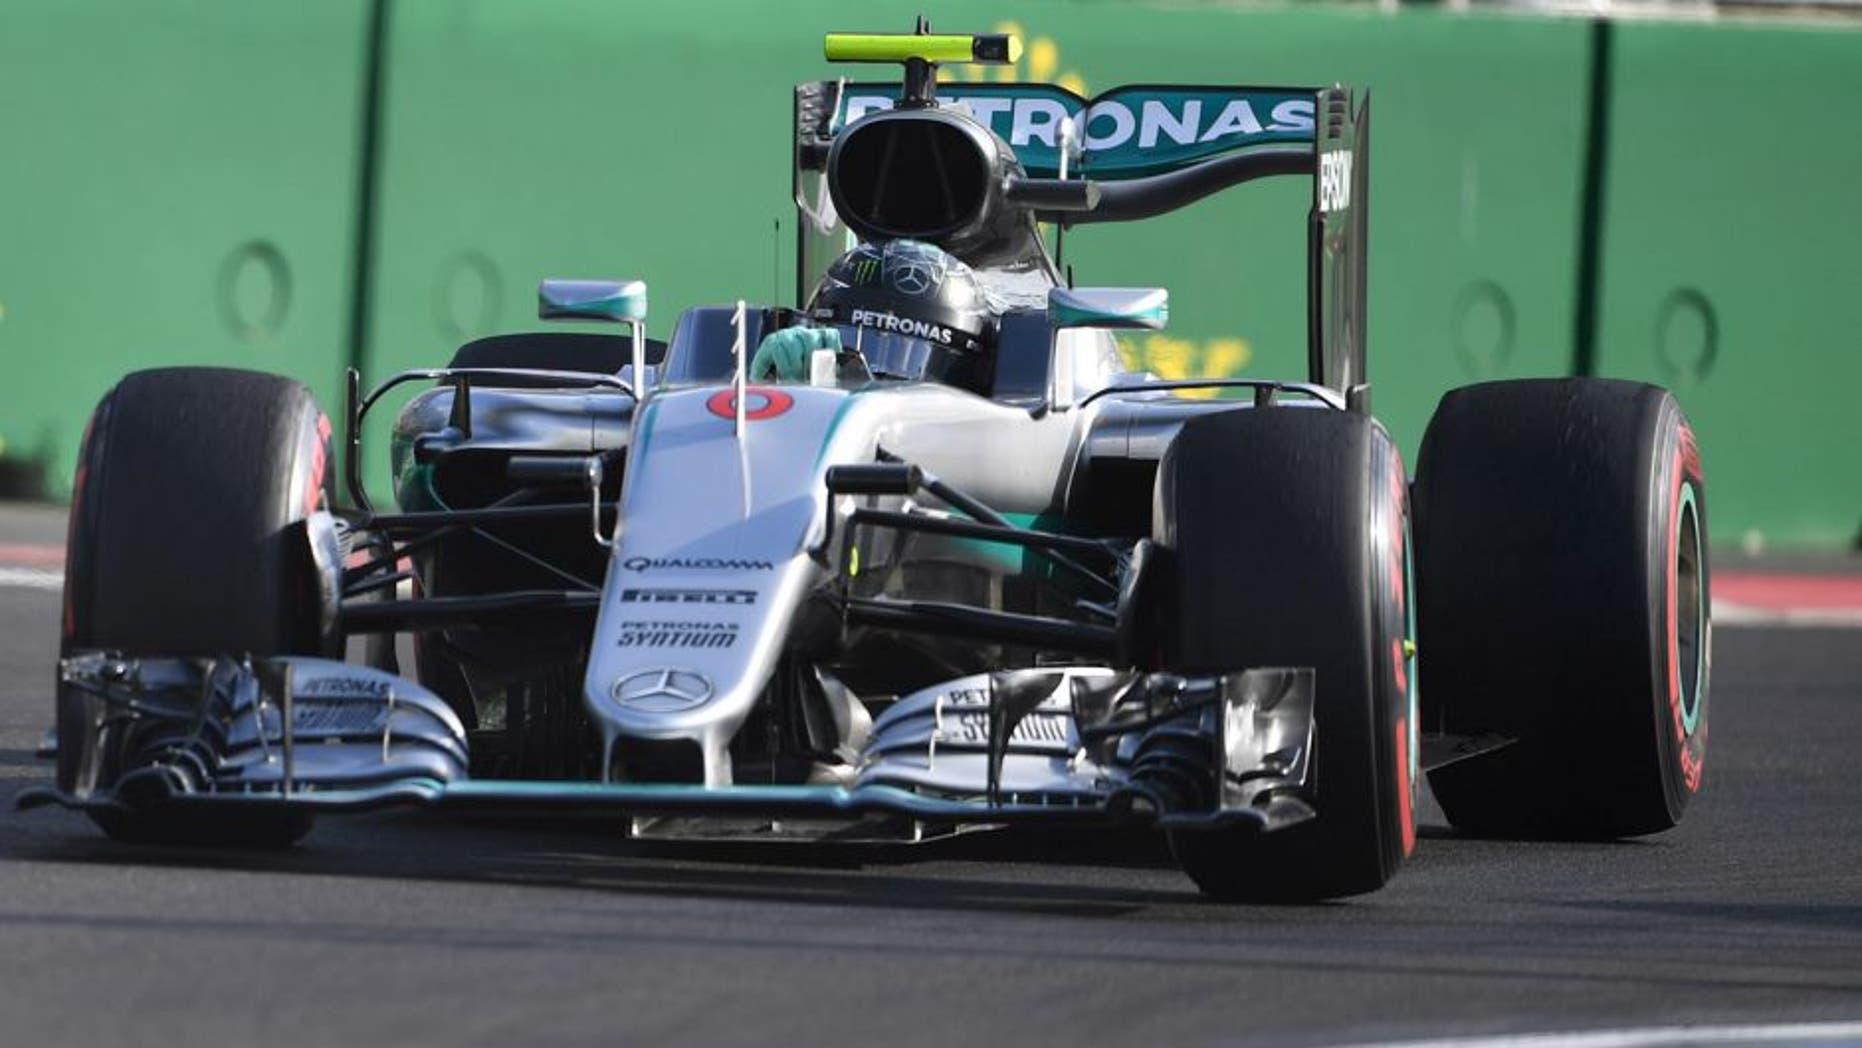 Mercedes AMG Petronas F1 Team's German driver Nico Rosberg steers his car at the Baku City Circuit, on June 19, 2016 in Baku, during the European Formula One Grand Prix. / AFP / ANDREJ ISAKOVIC (Photo credit should read ANDREJ ISAKOVIC/AFP/Getty Images)